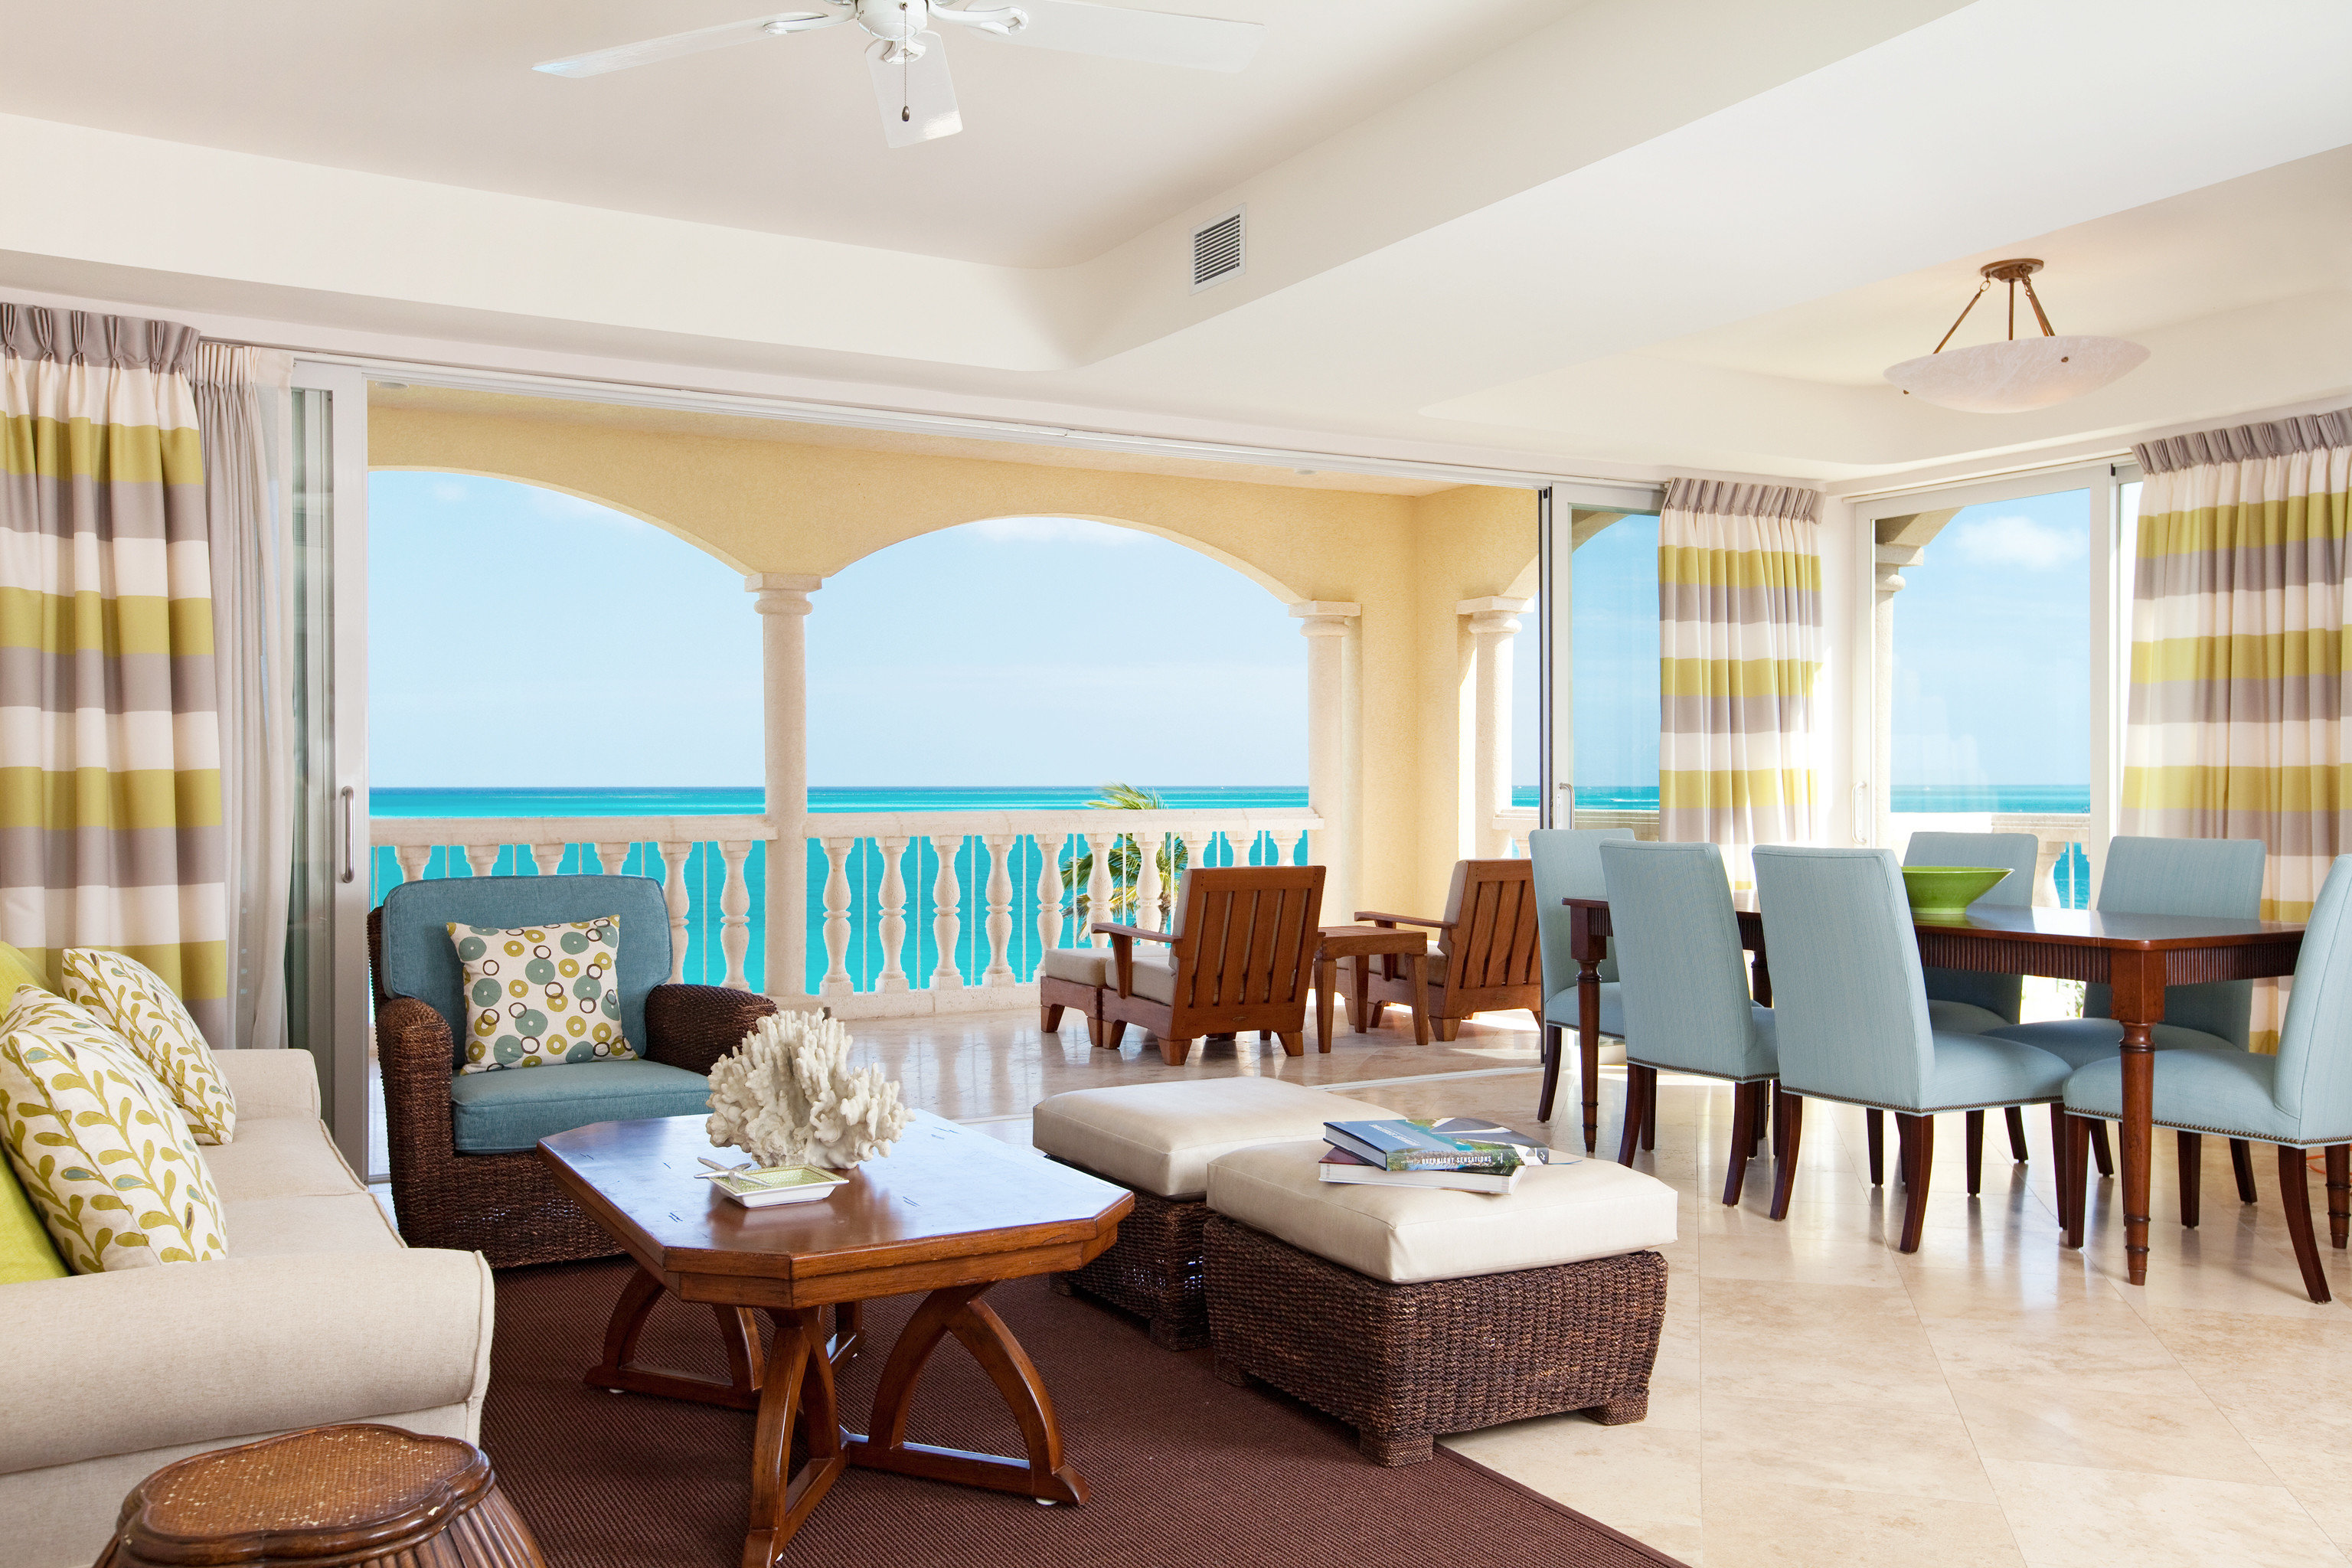 Beachfront Bedroom Hotels Luxury Romance Trip Ideas property living room Resort Suite home Villa condominium function hall restaurant